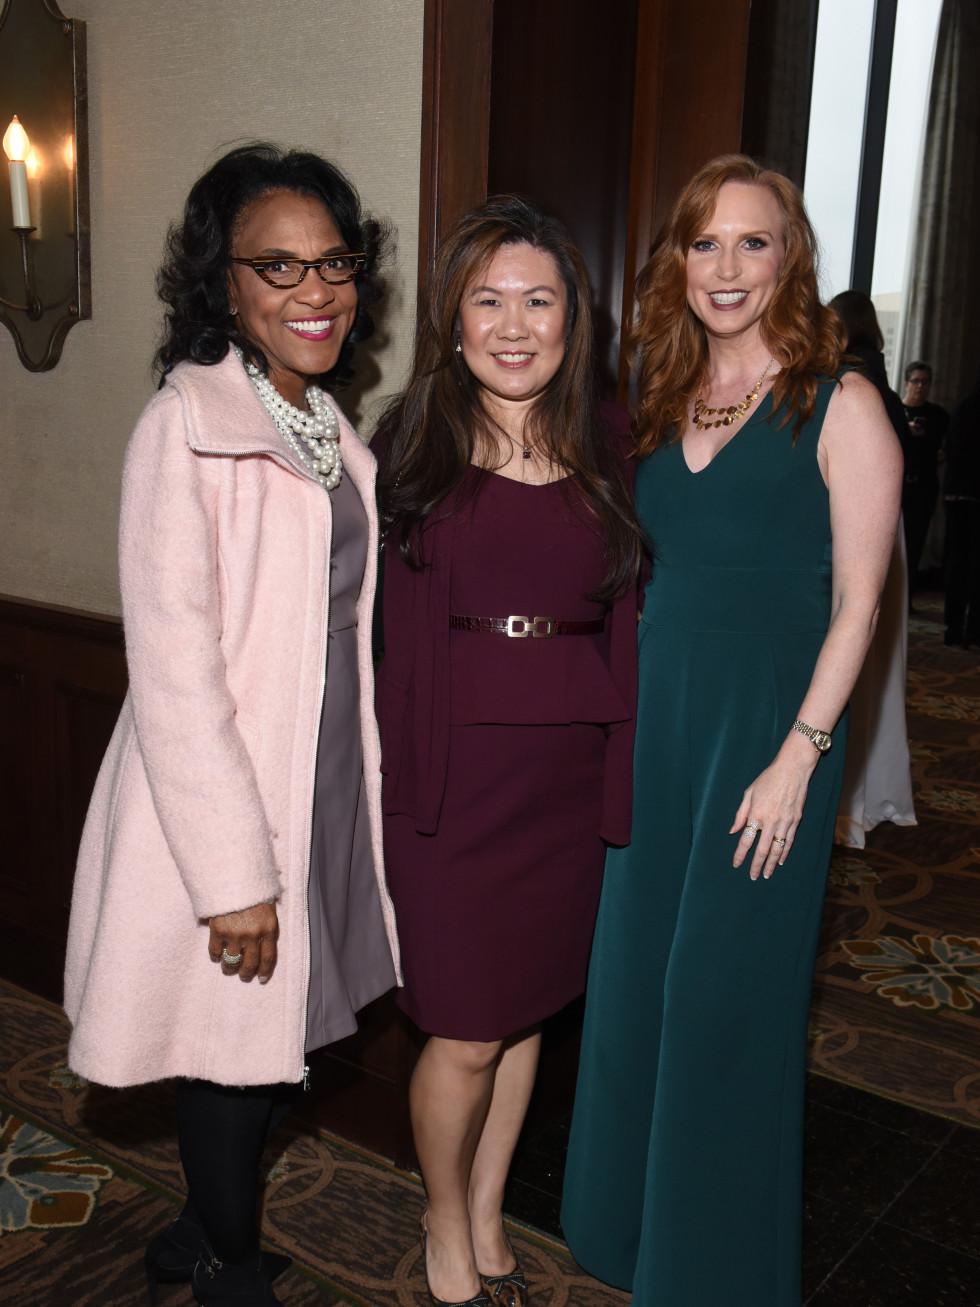 Dr. Cathy W. Moffitt, Patsy Yung Micale, Jennifer Owens